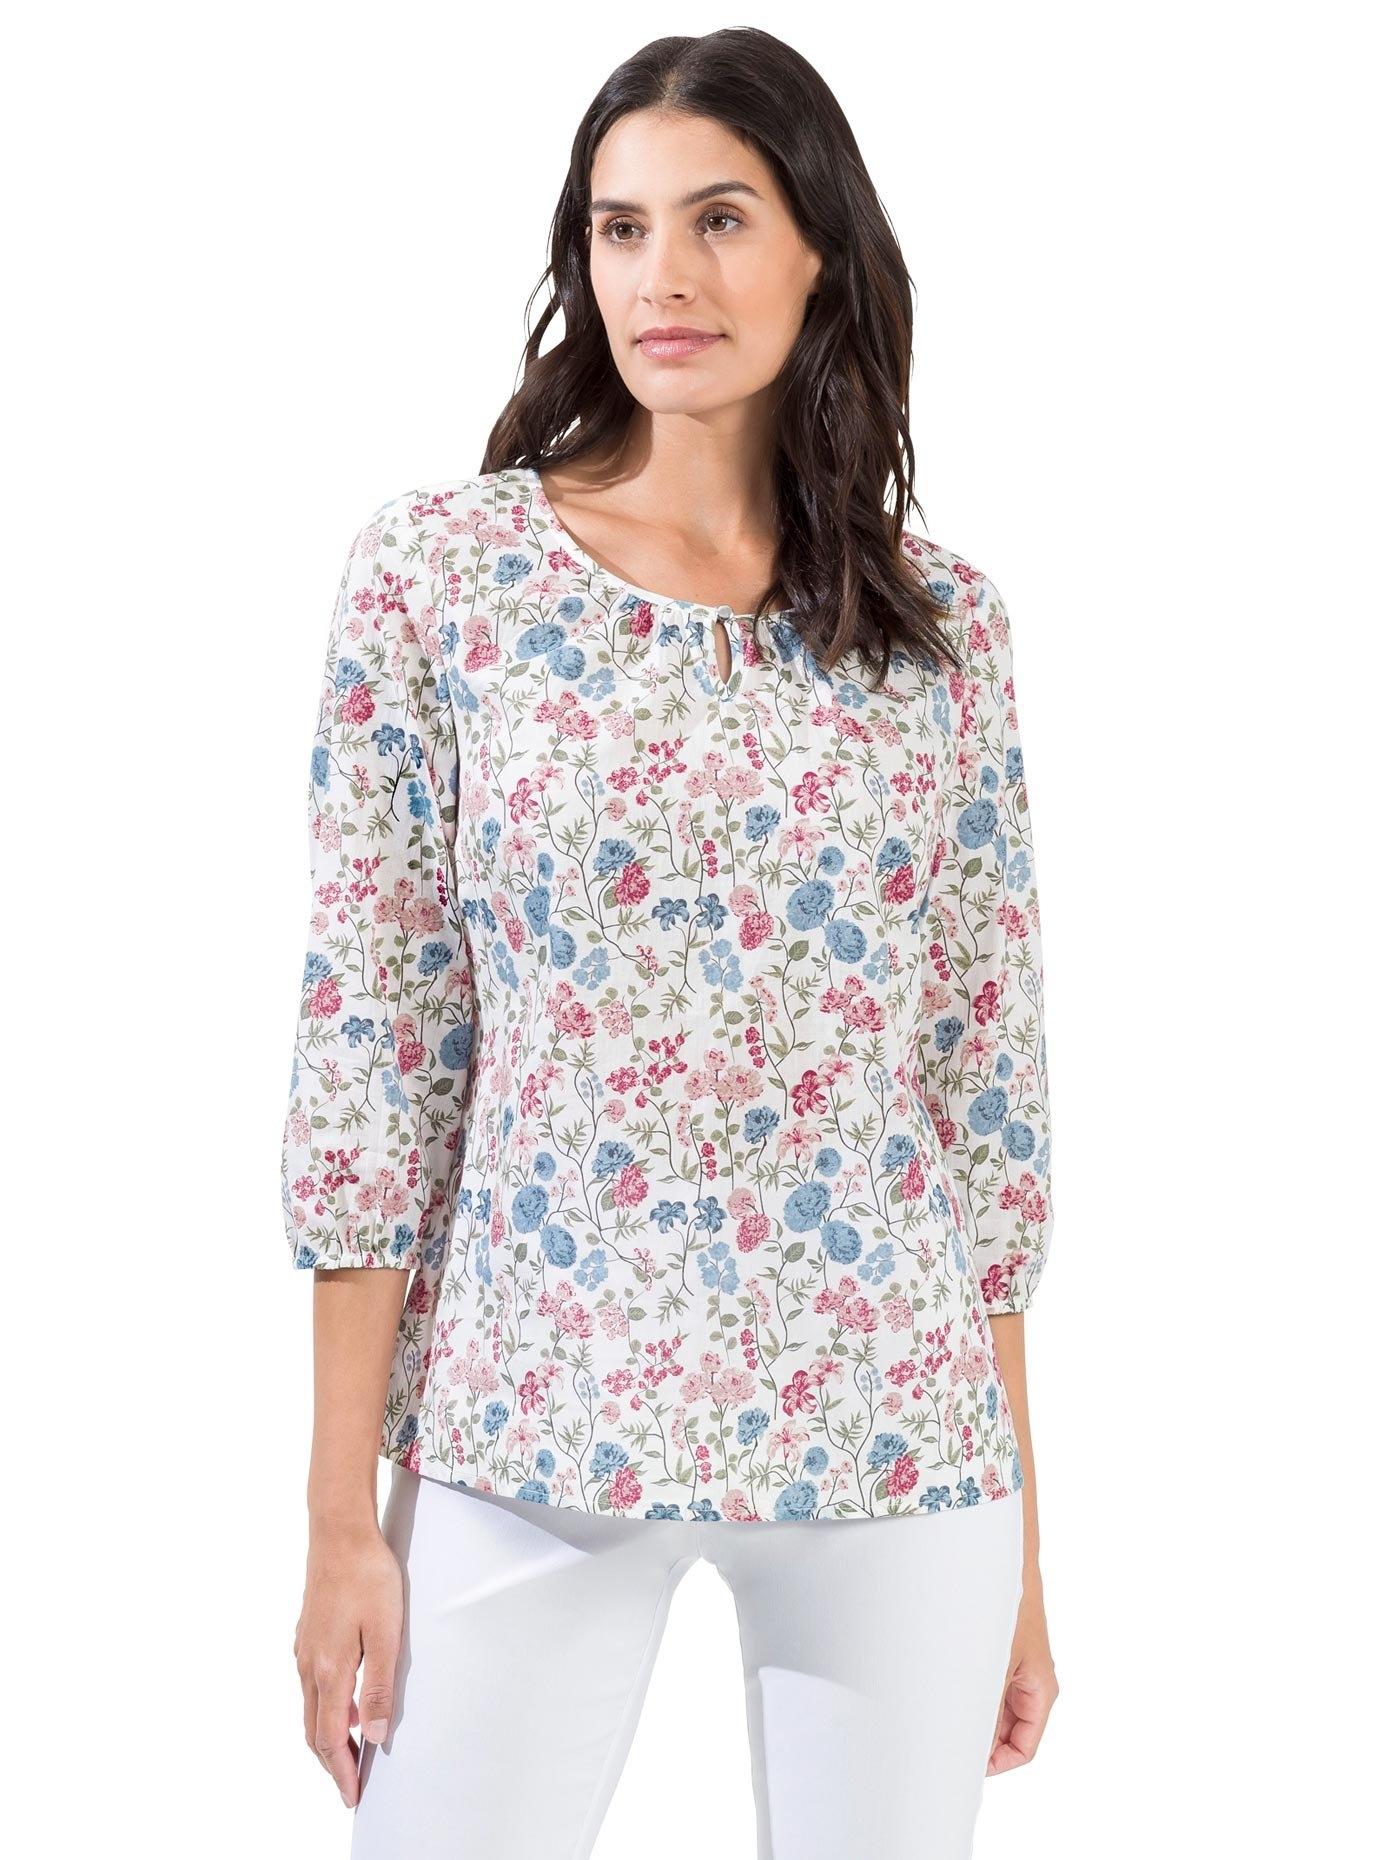 Classic Inspirationen blouse zonder sluiting - verschillende betaalmethodes